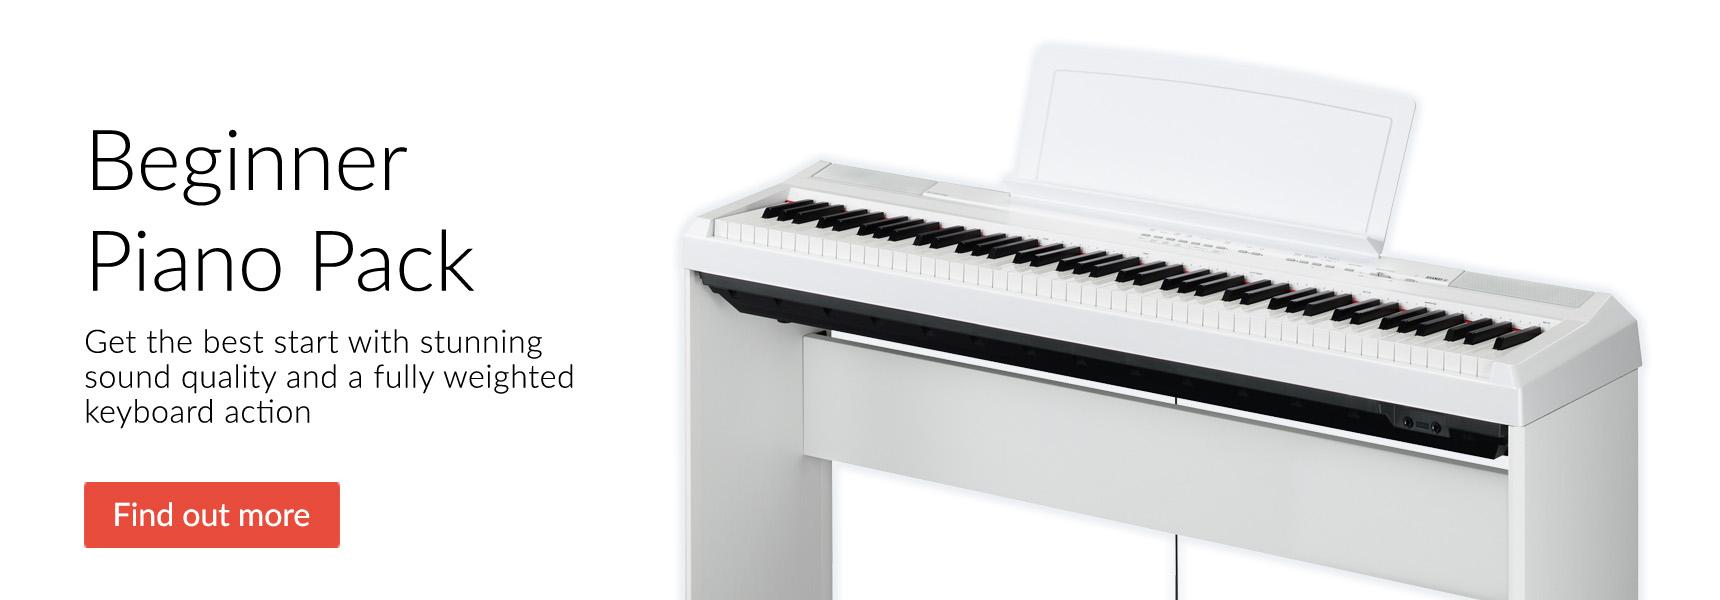 keyboards for beginners yamaha music london. Black Bedroom Furniture Sets. Home Design Ideas